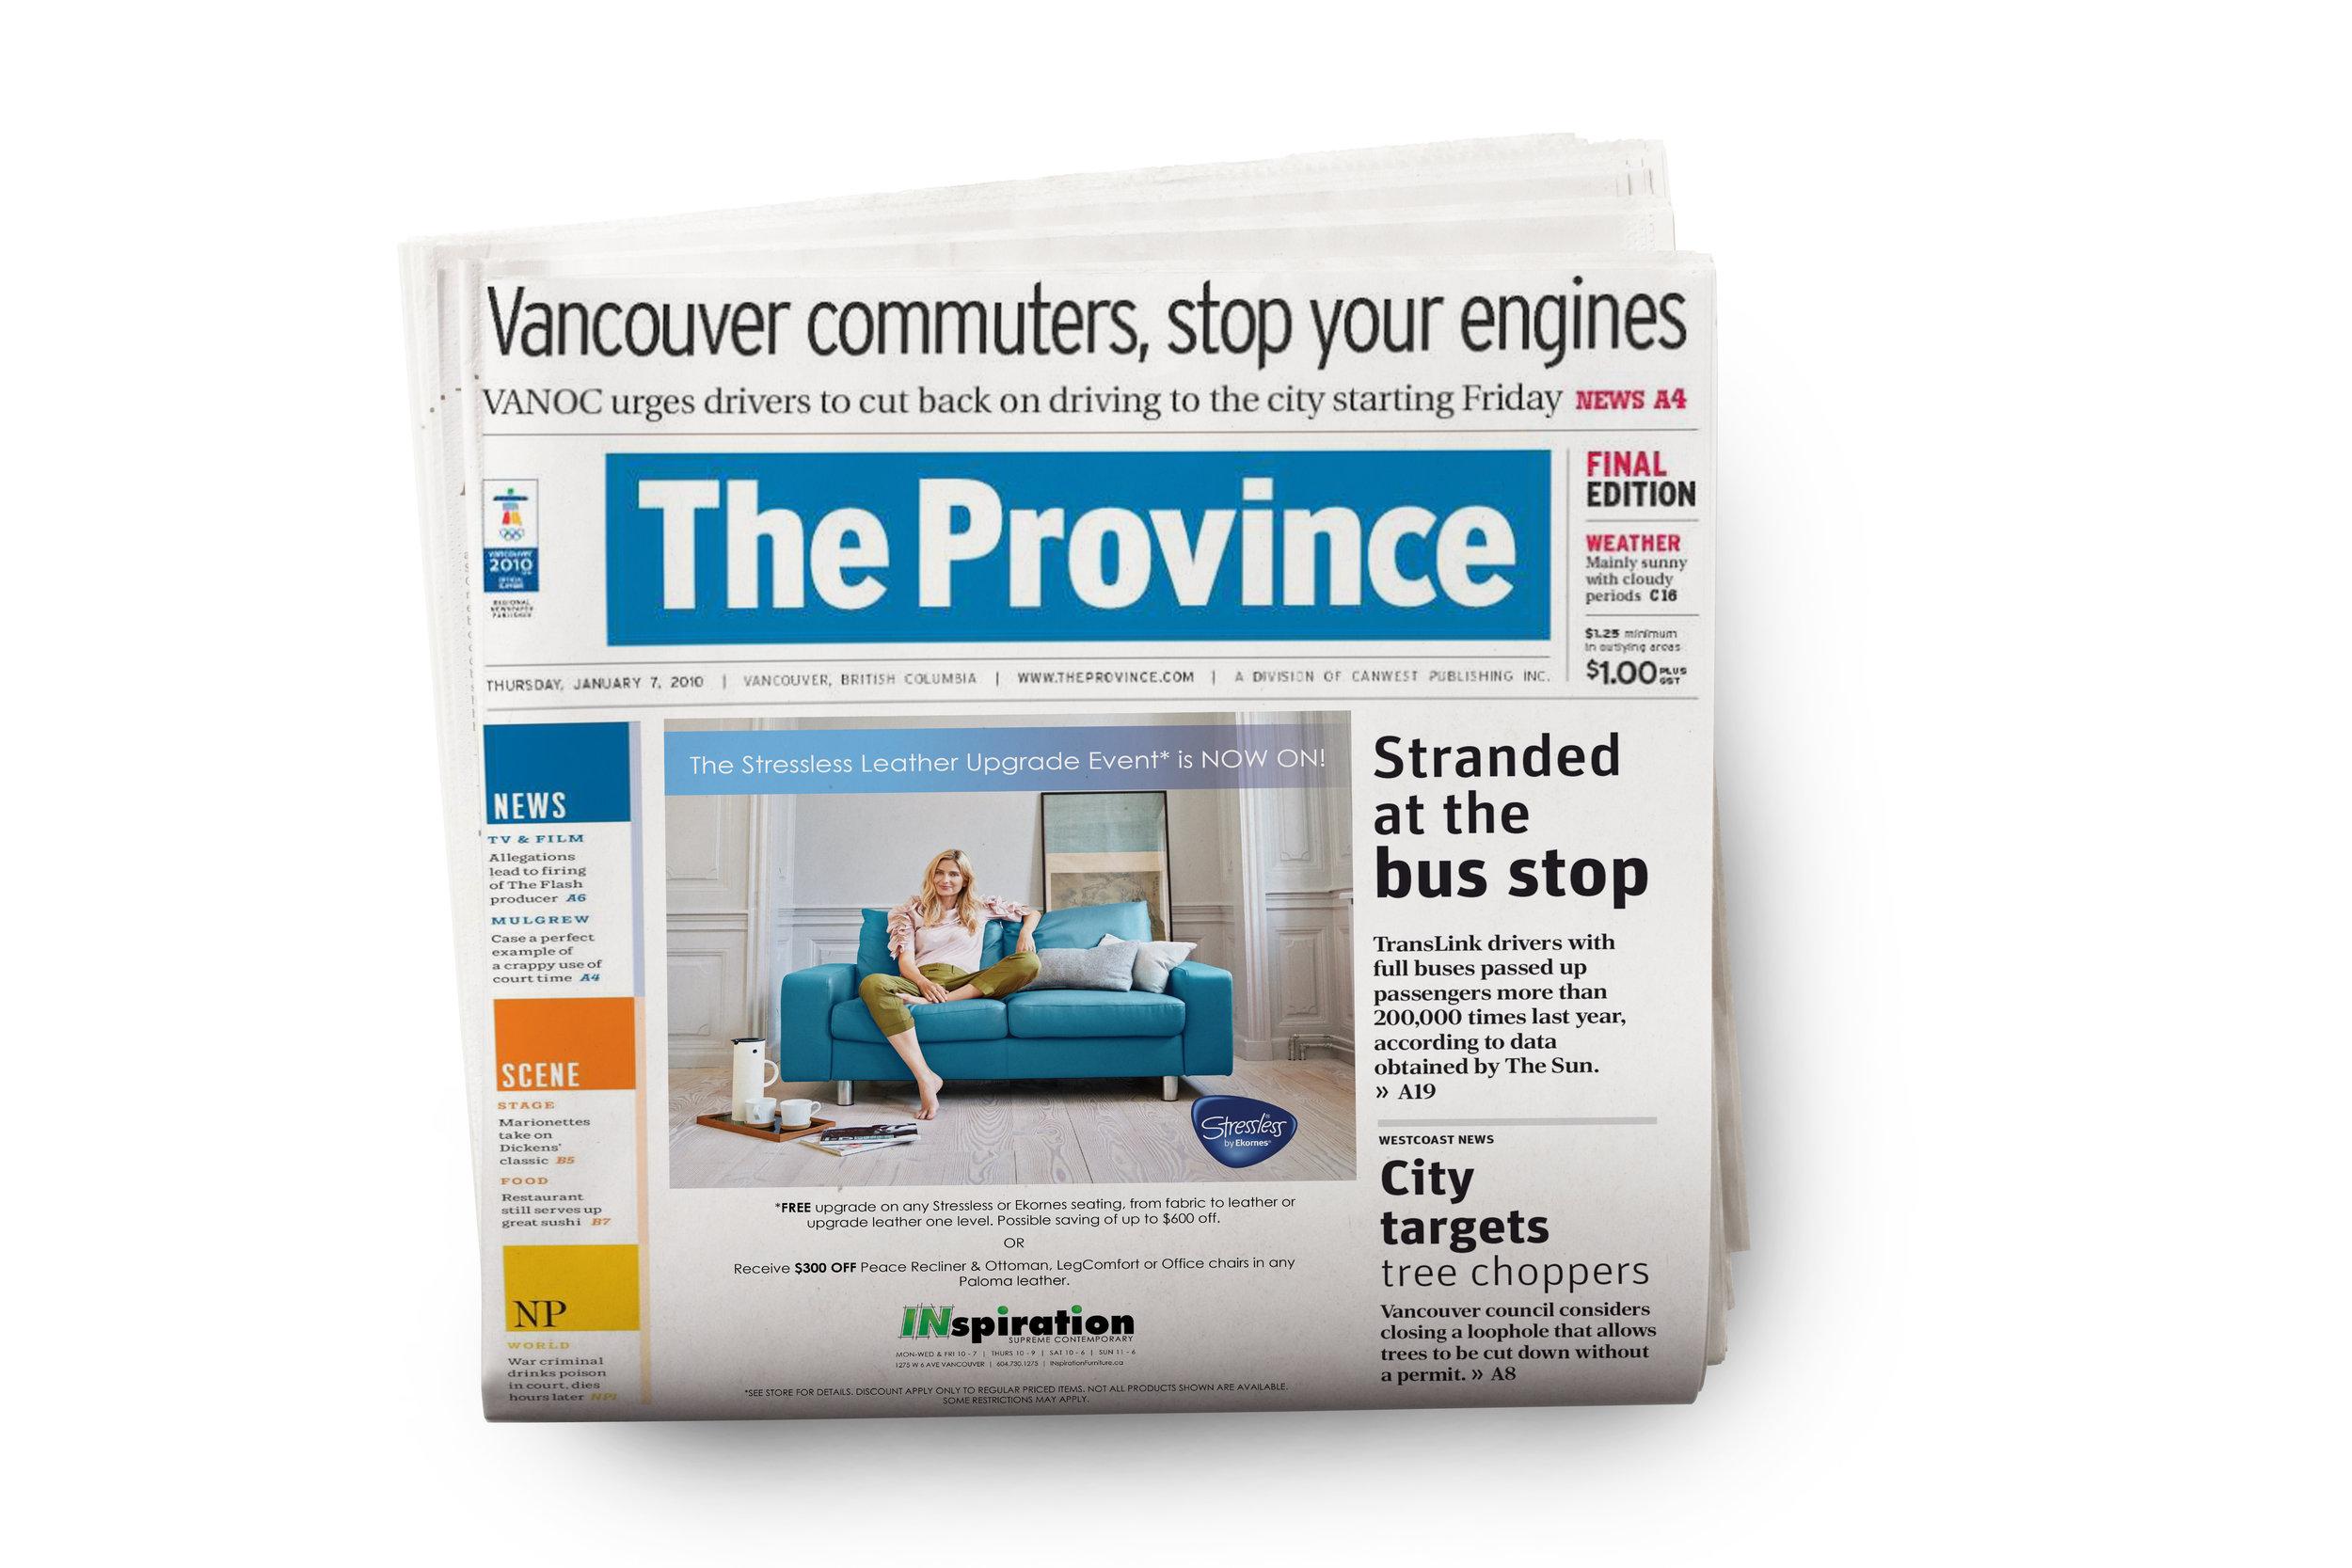 IN_Province_Newspaper7.jpg